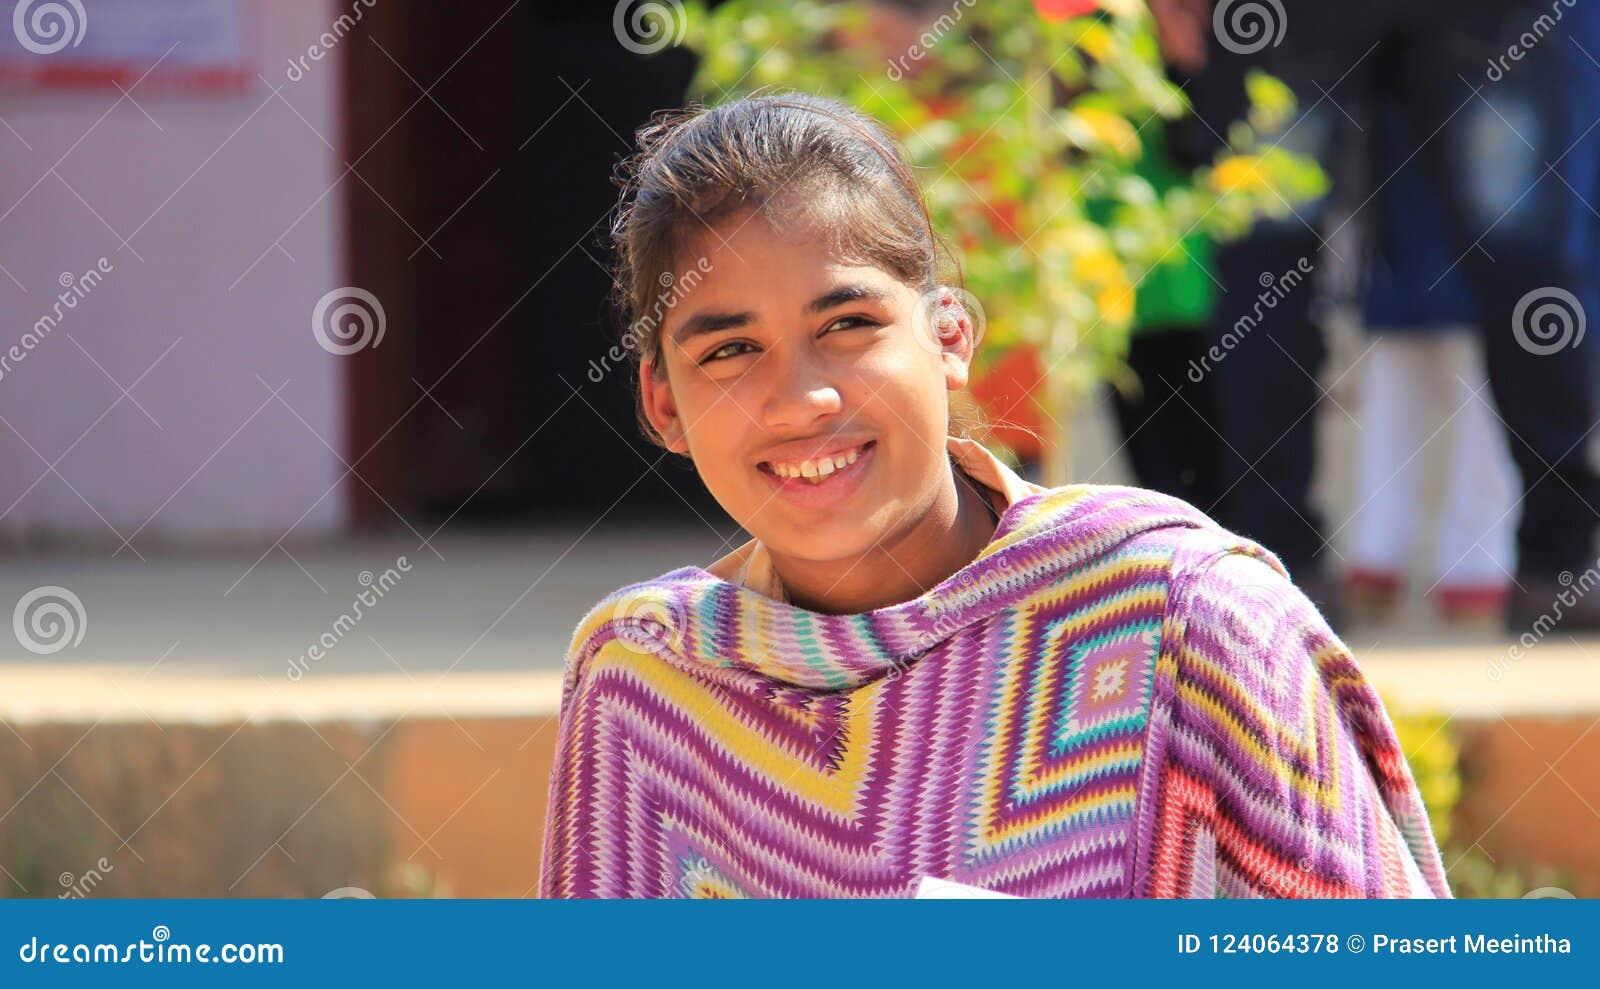 Student girls joyful outdoor classroom with warm sunshine editorial student girls joyful outdoor classroom with warm sunshine m4hsunfo